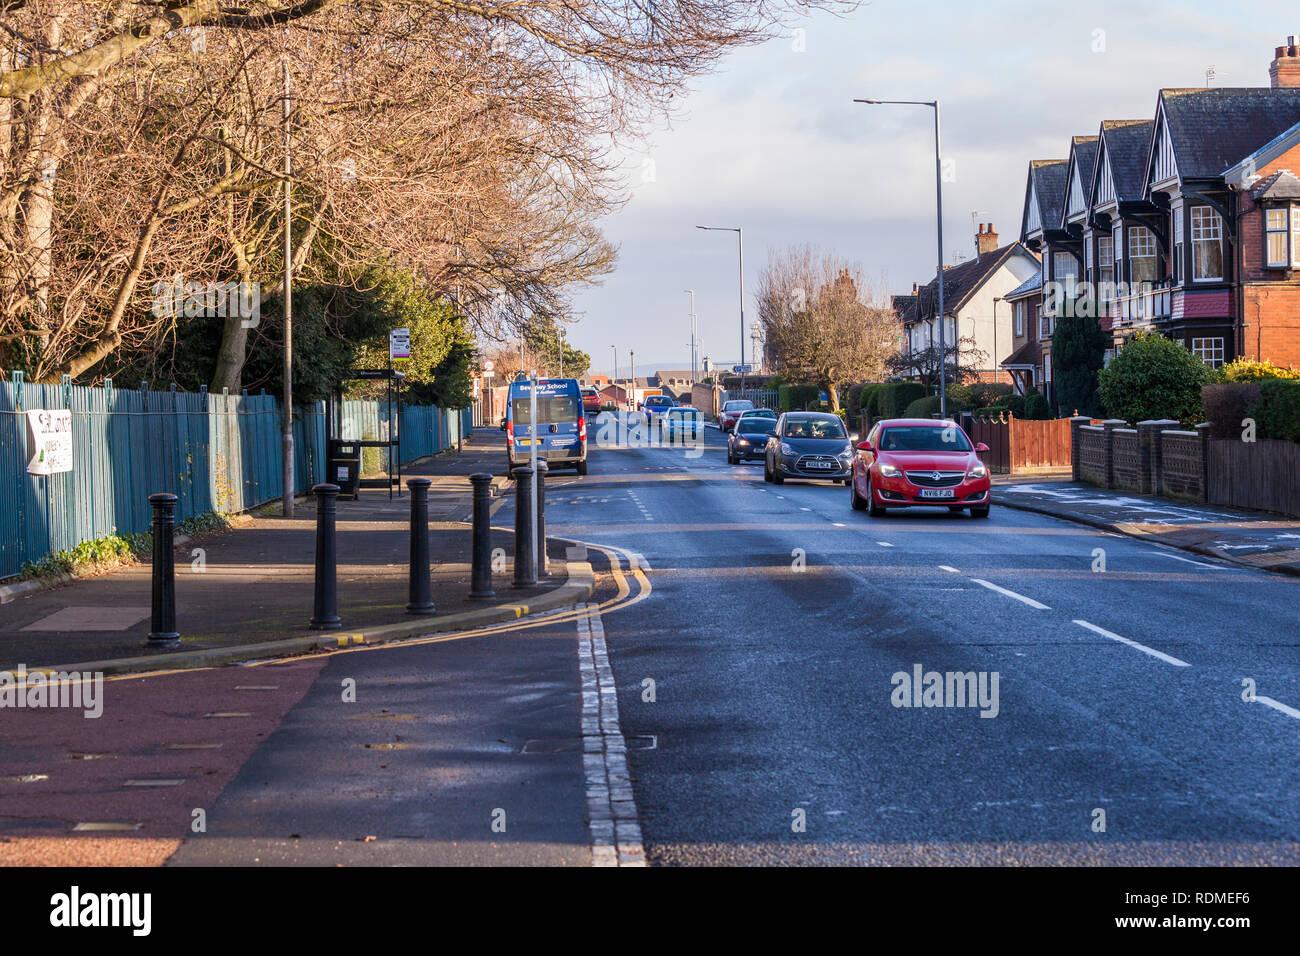 The A1027 Hartburn Lane road in Stockton on Tees, England, UK Stock Photo